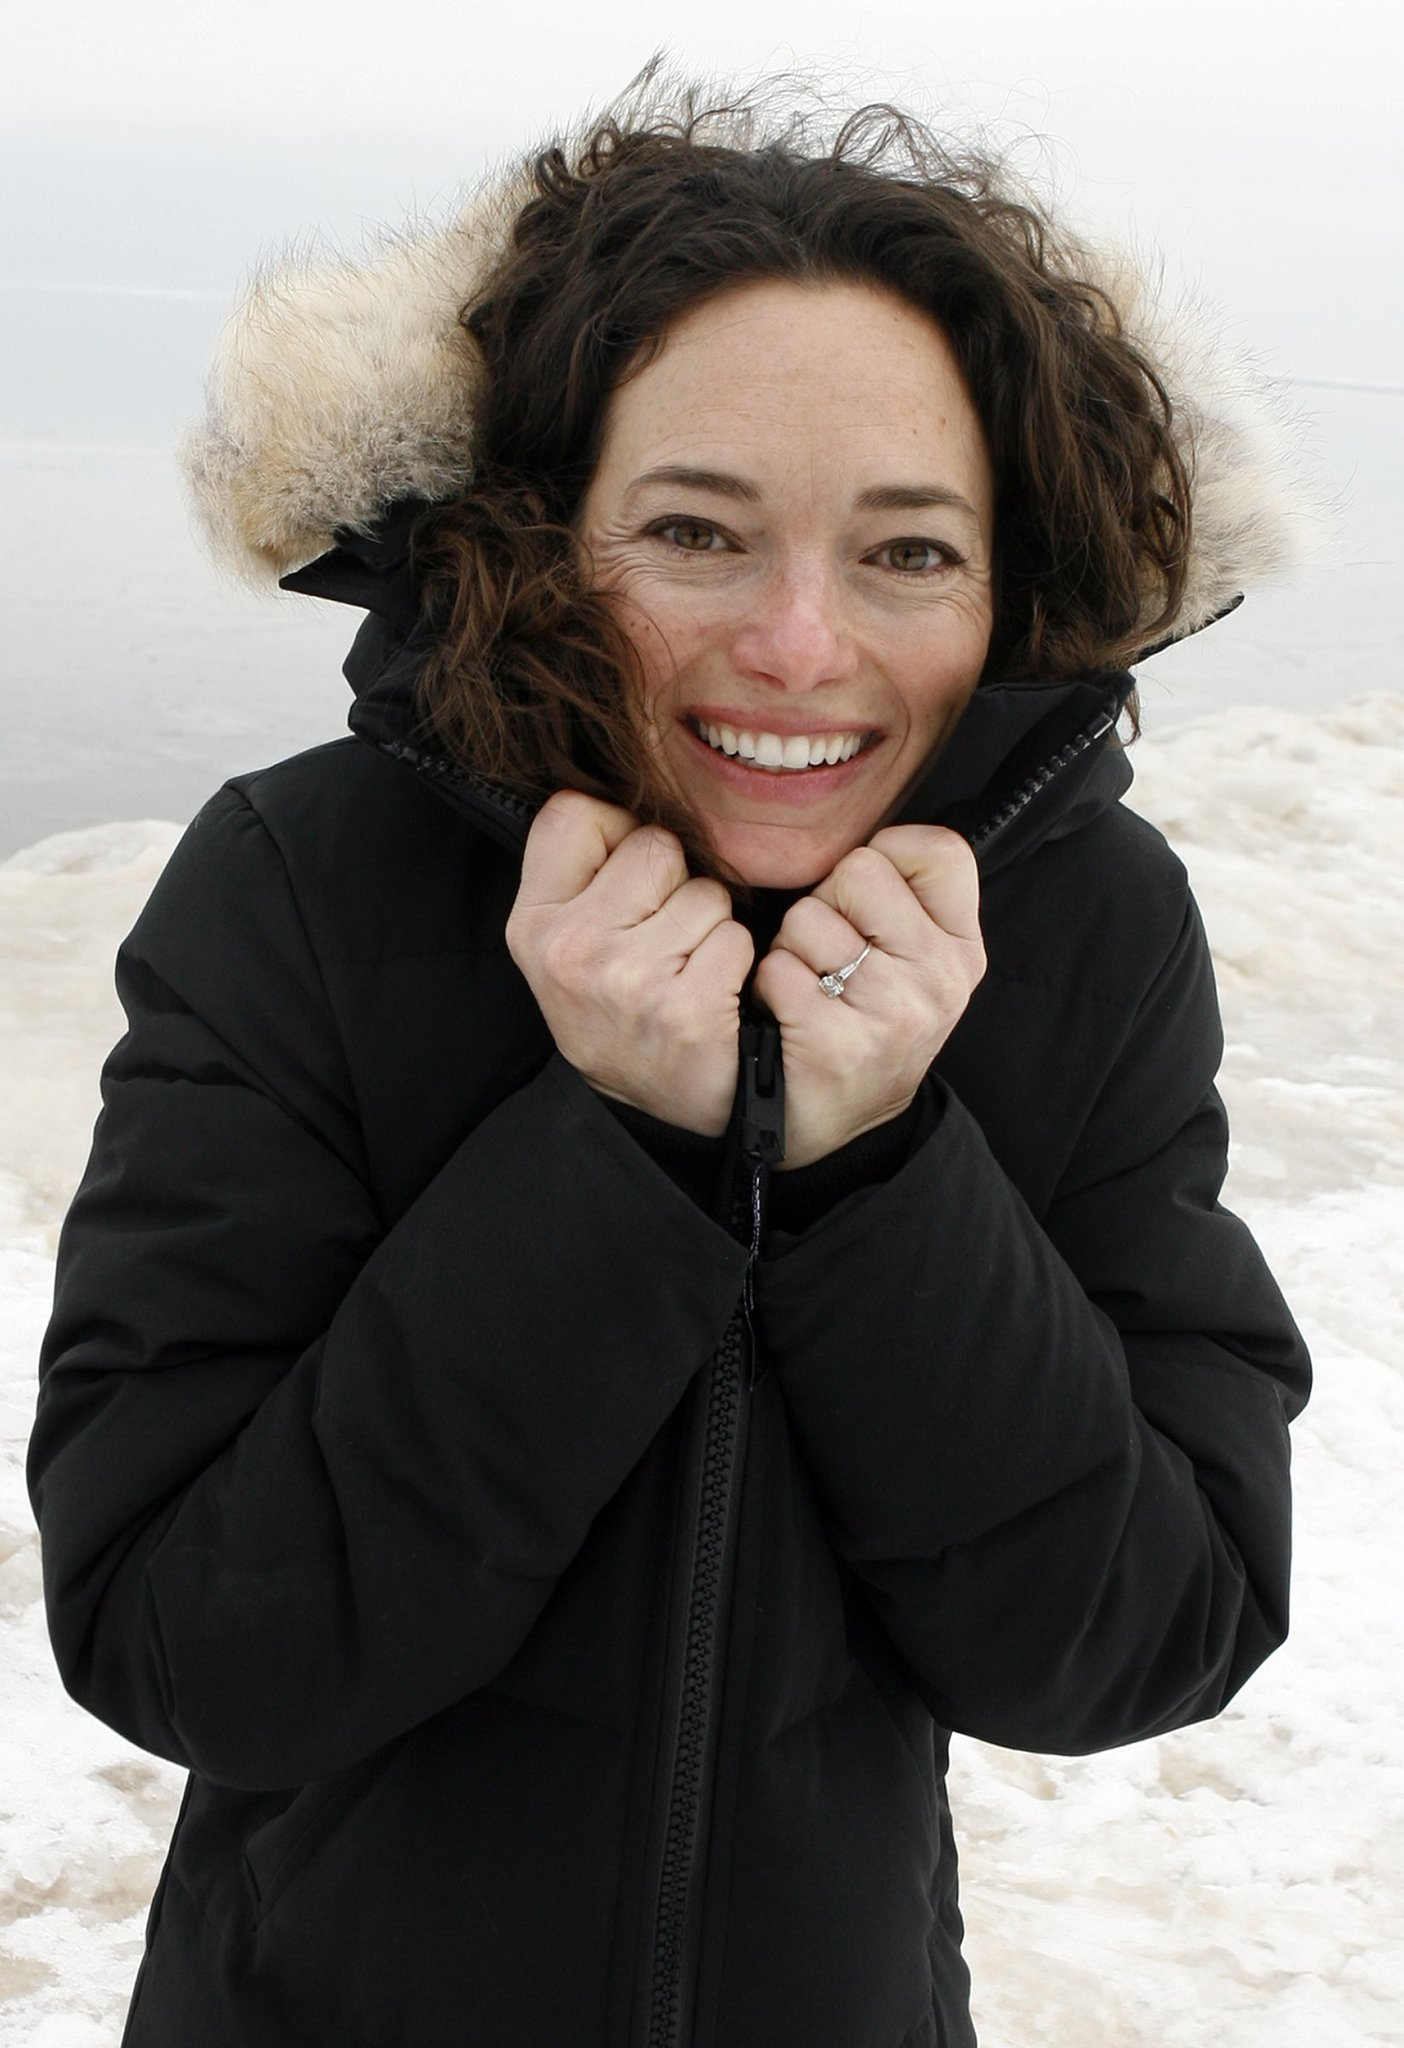 Warmest winter coats - Chicago Tribune